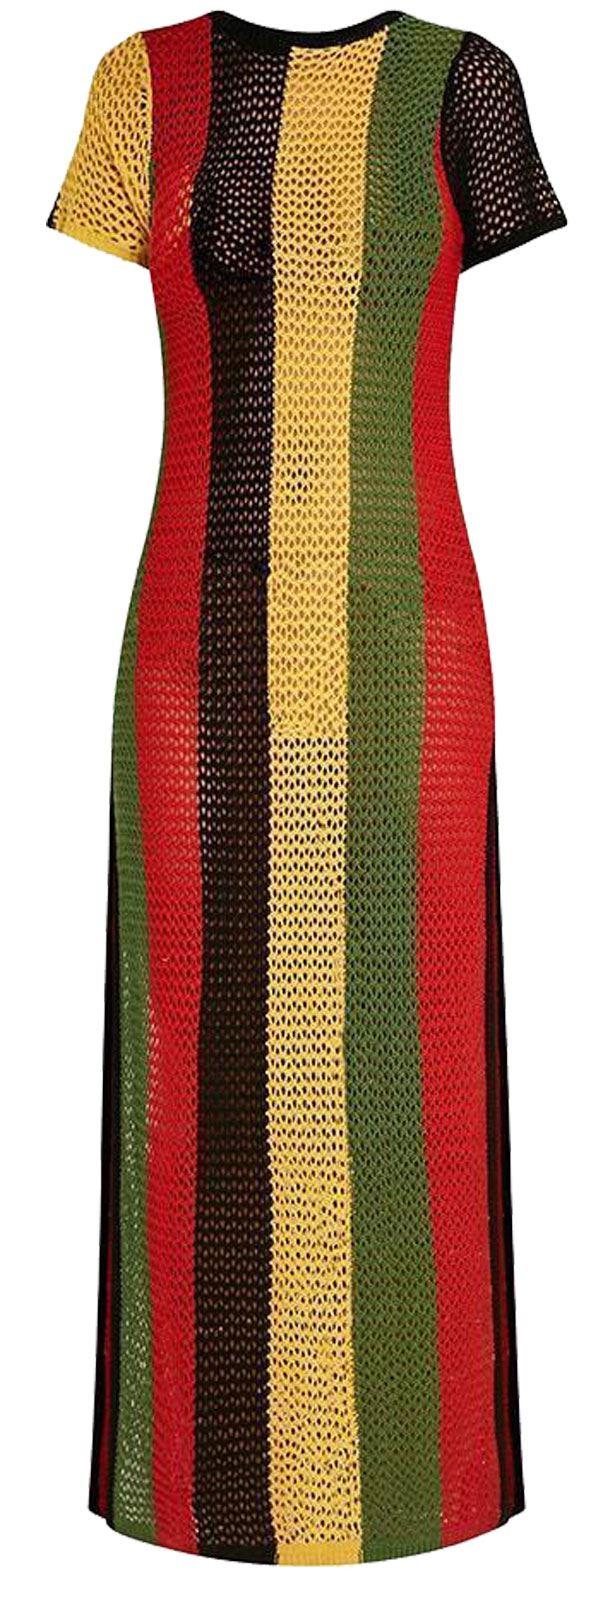 bb0c8e9b7e71e Ladies Rasta Multicolored Side Slit String Mesh Maxi Dress   eBay